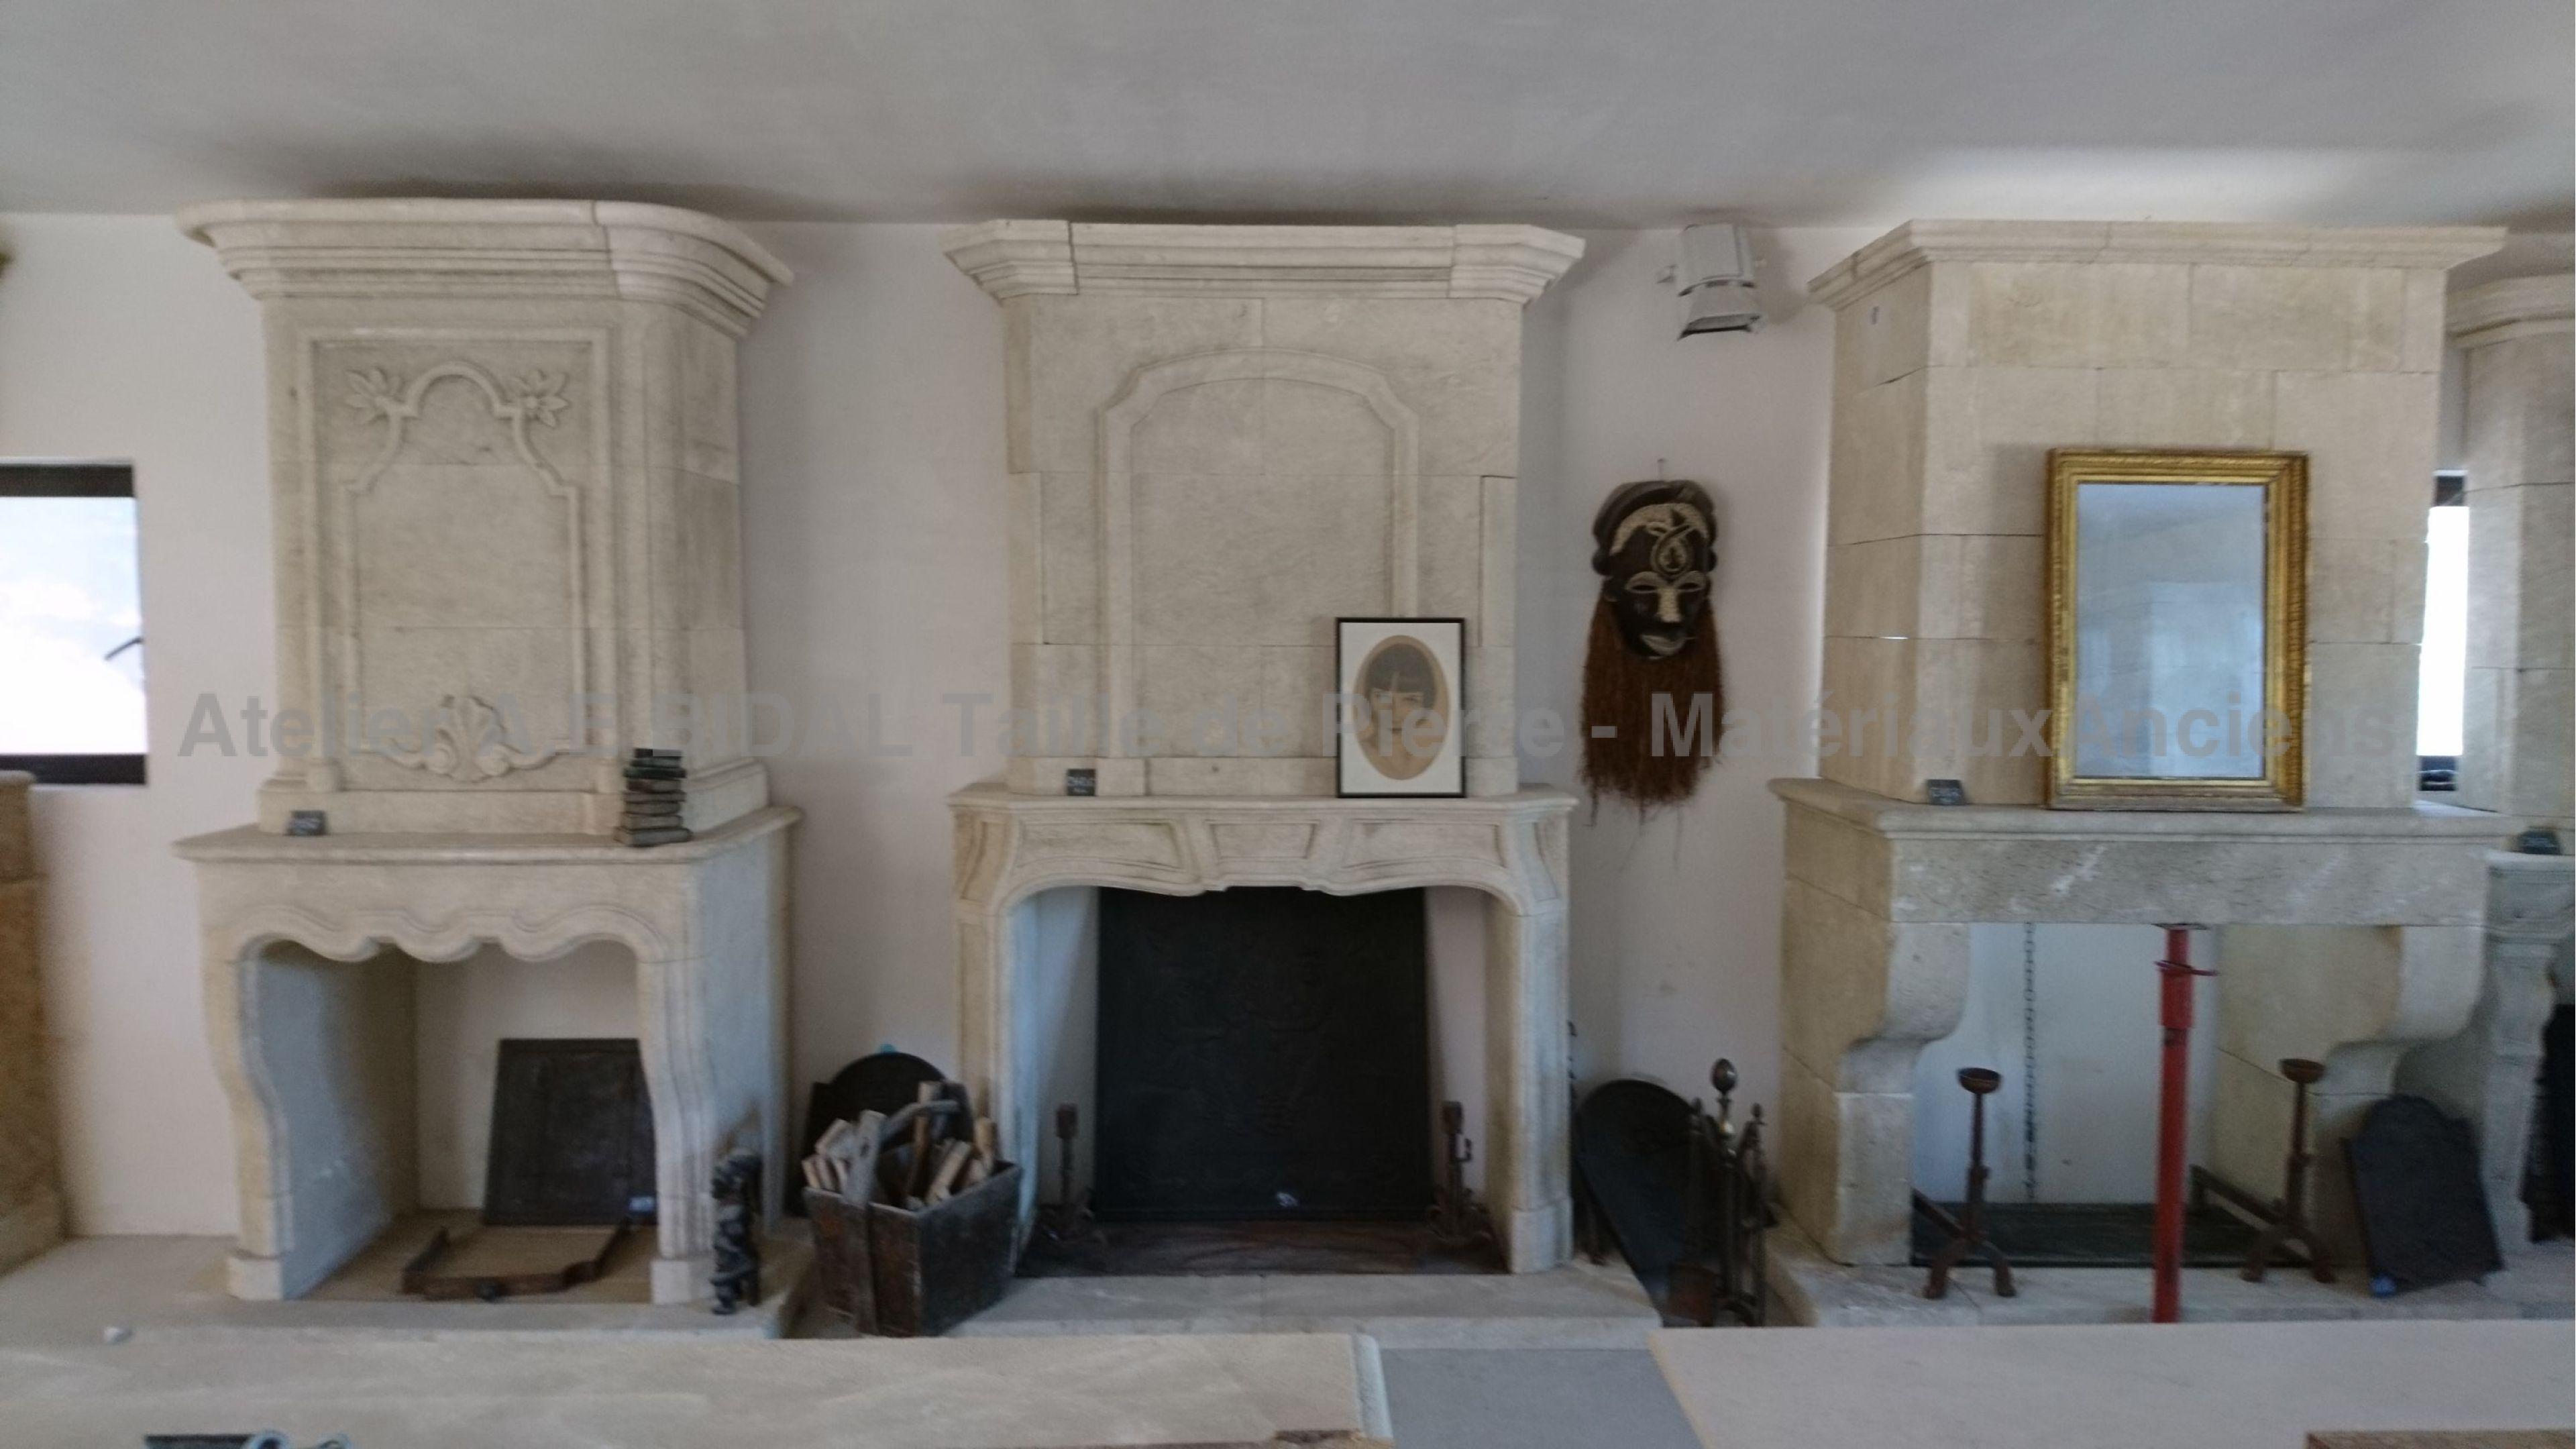 Alain Bidal with alain bidal's stone fireplaces, have a warm winter !